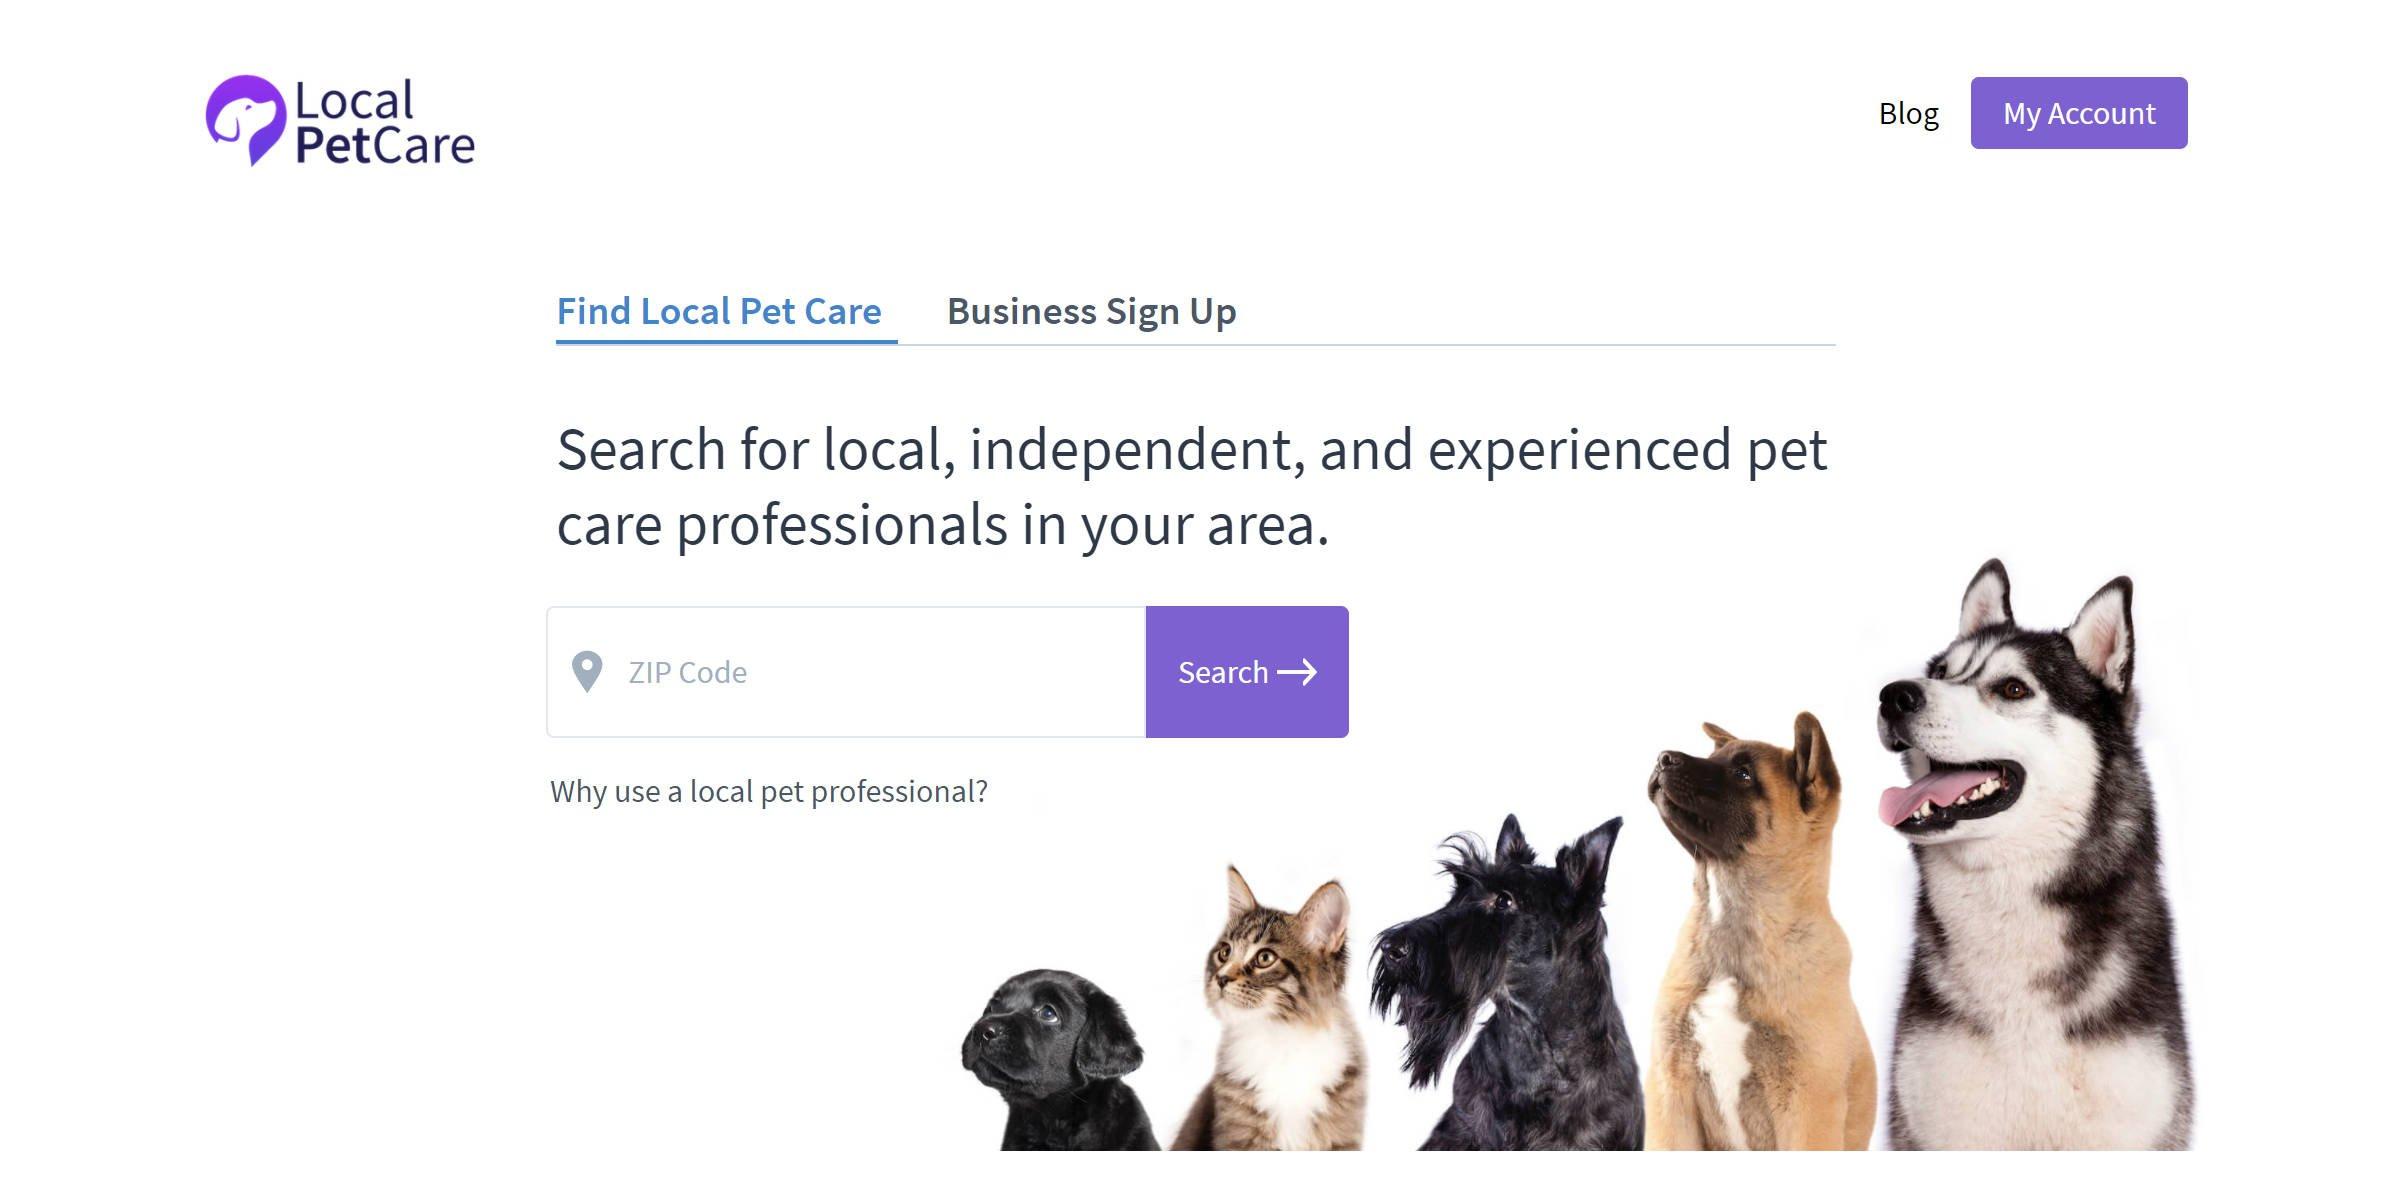 local-pet-care-blog-summary-image.jpg